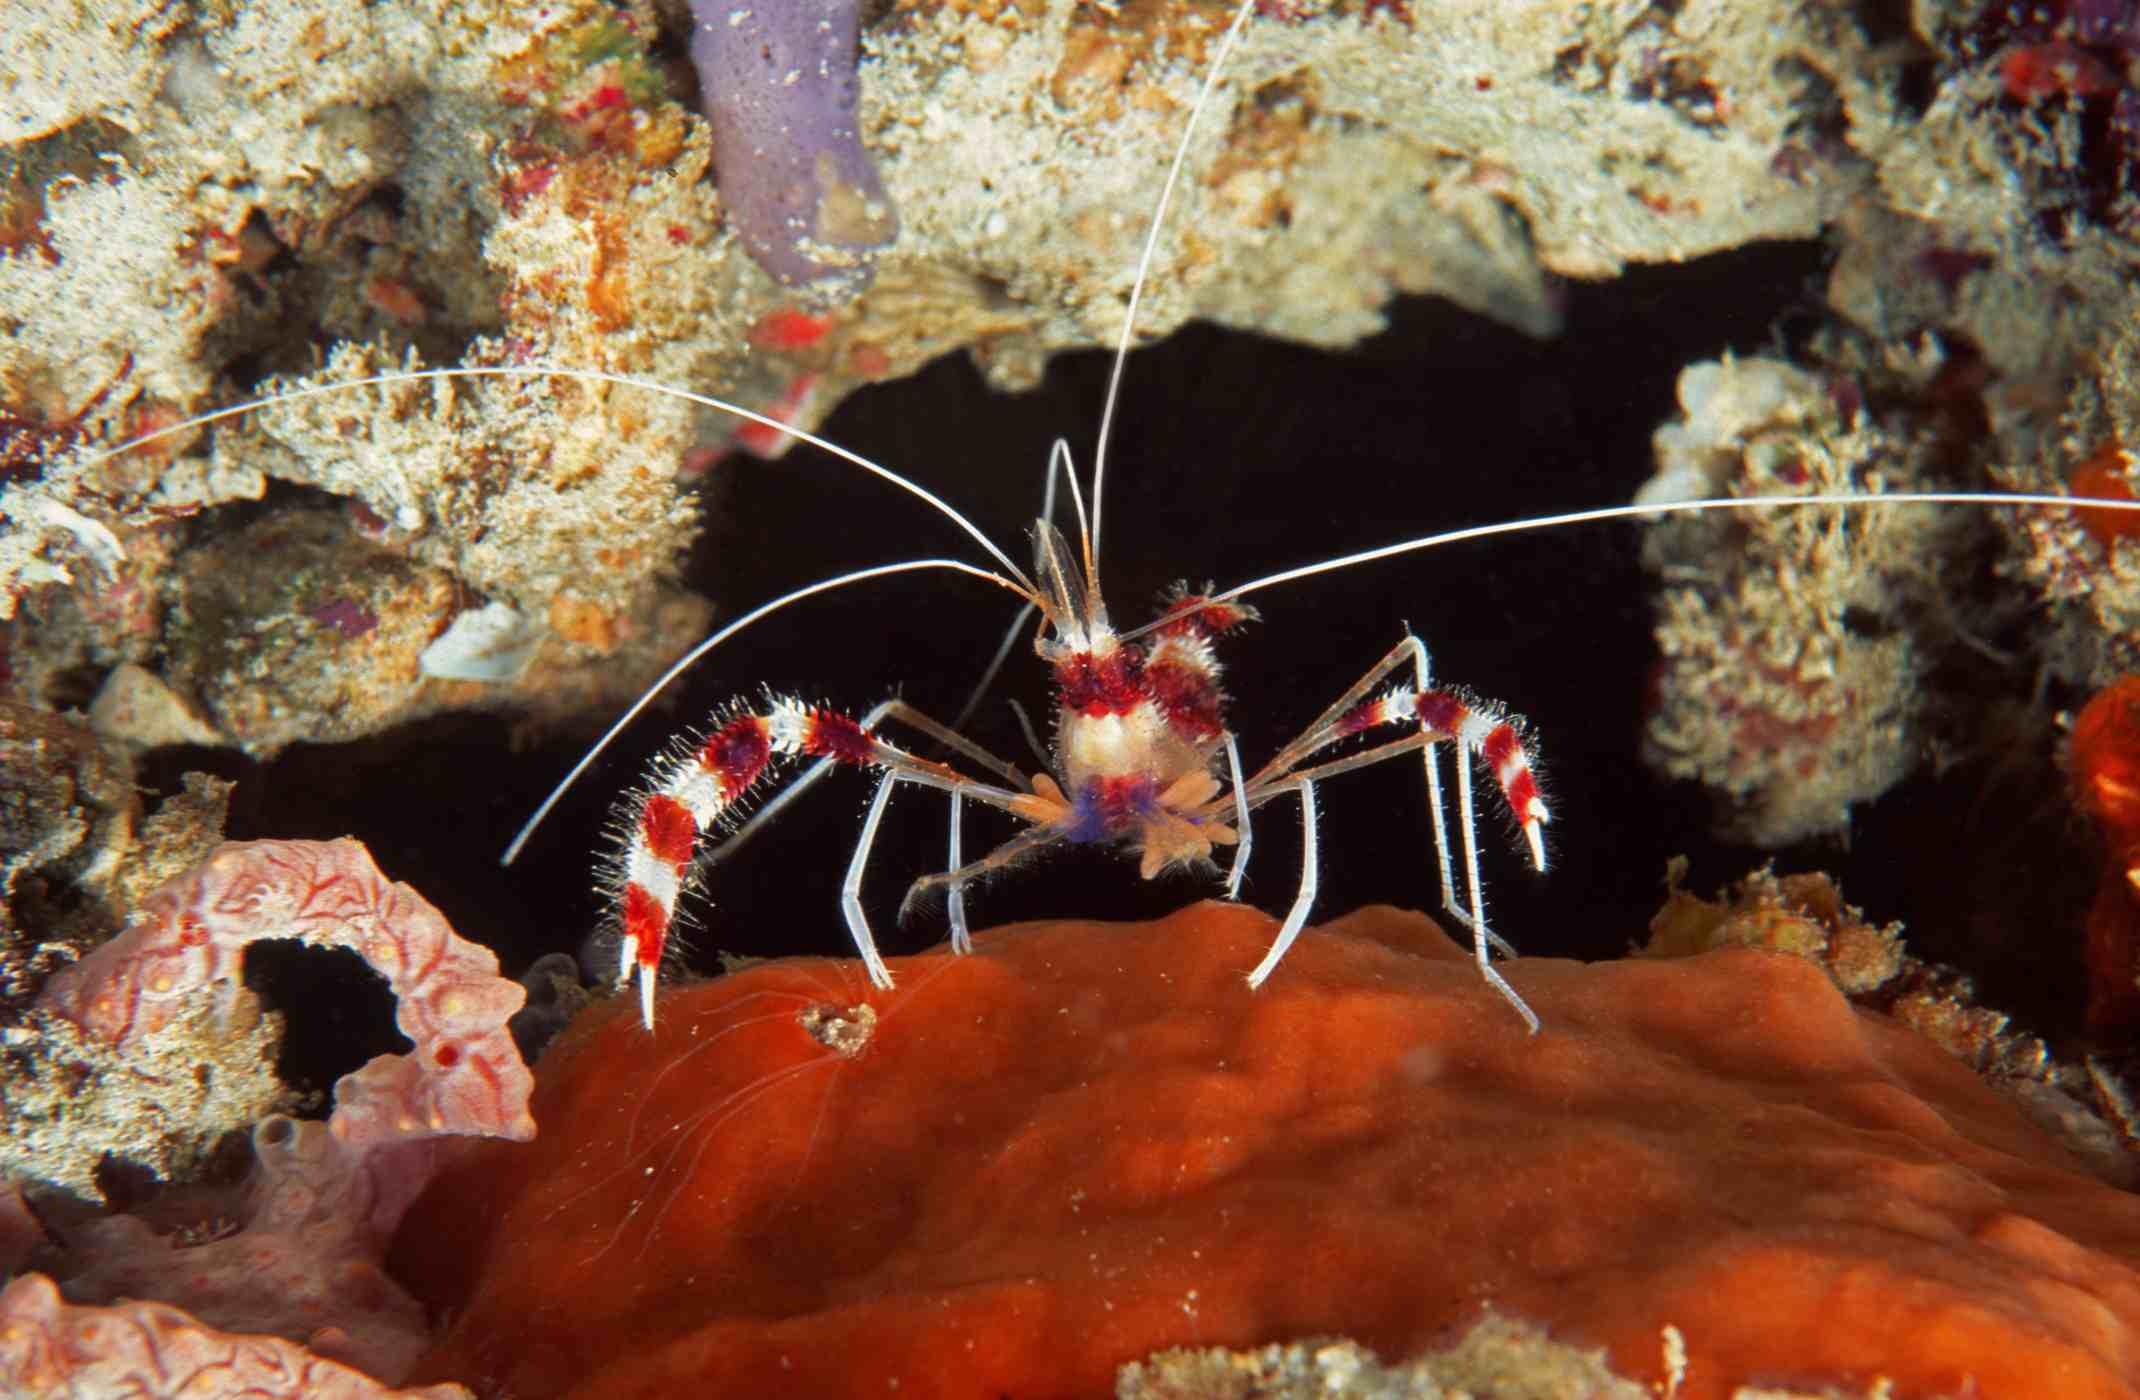 Banded cleaner shrimp sitting on coral reef